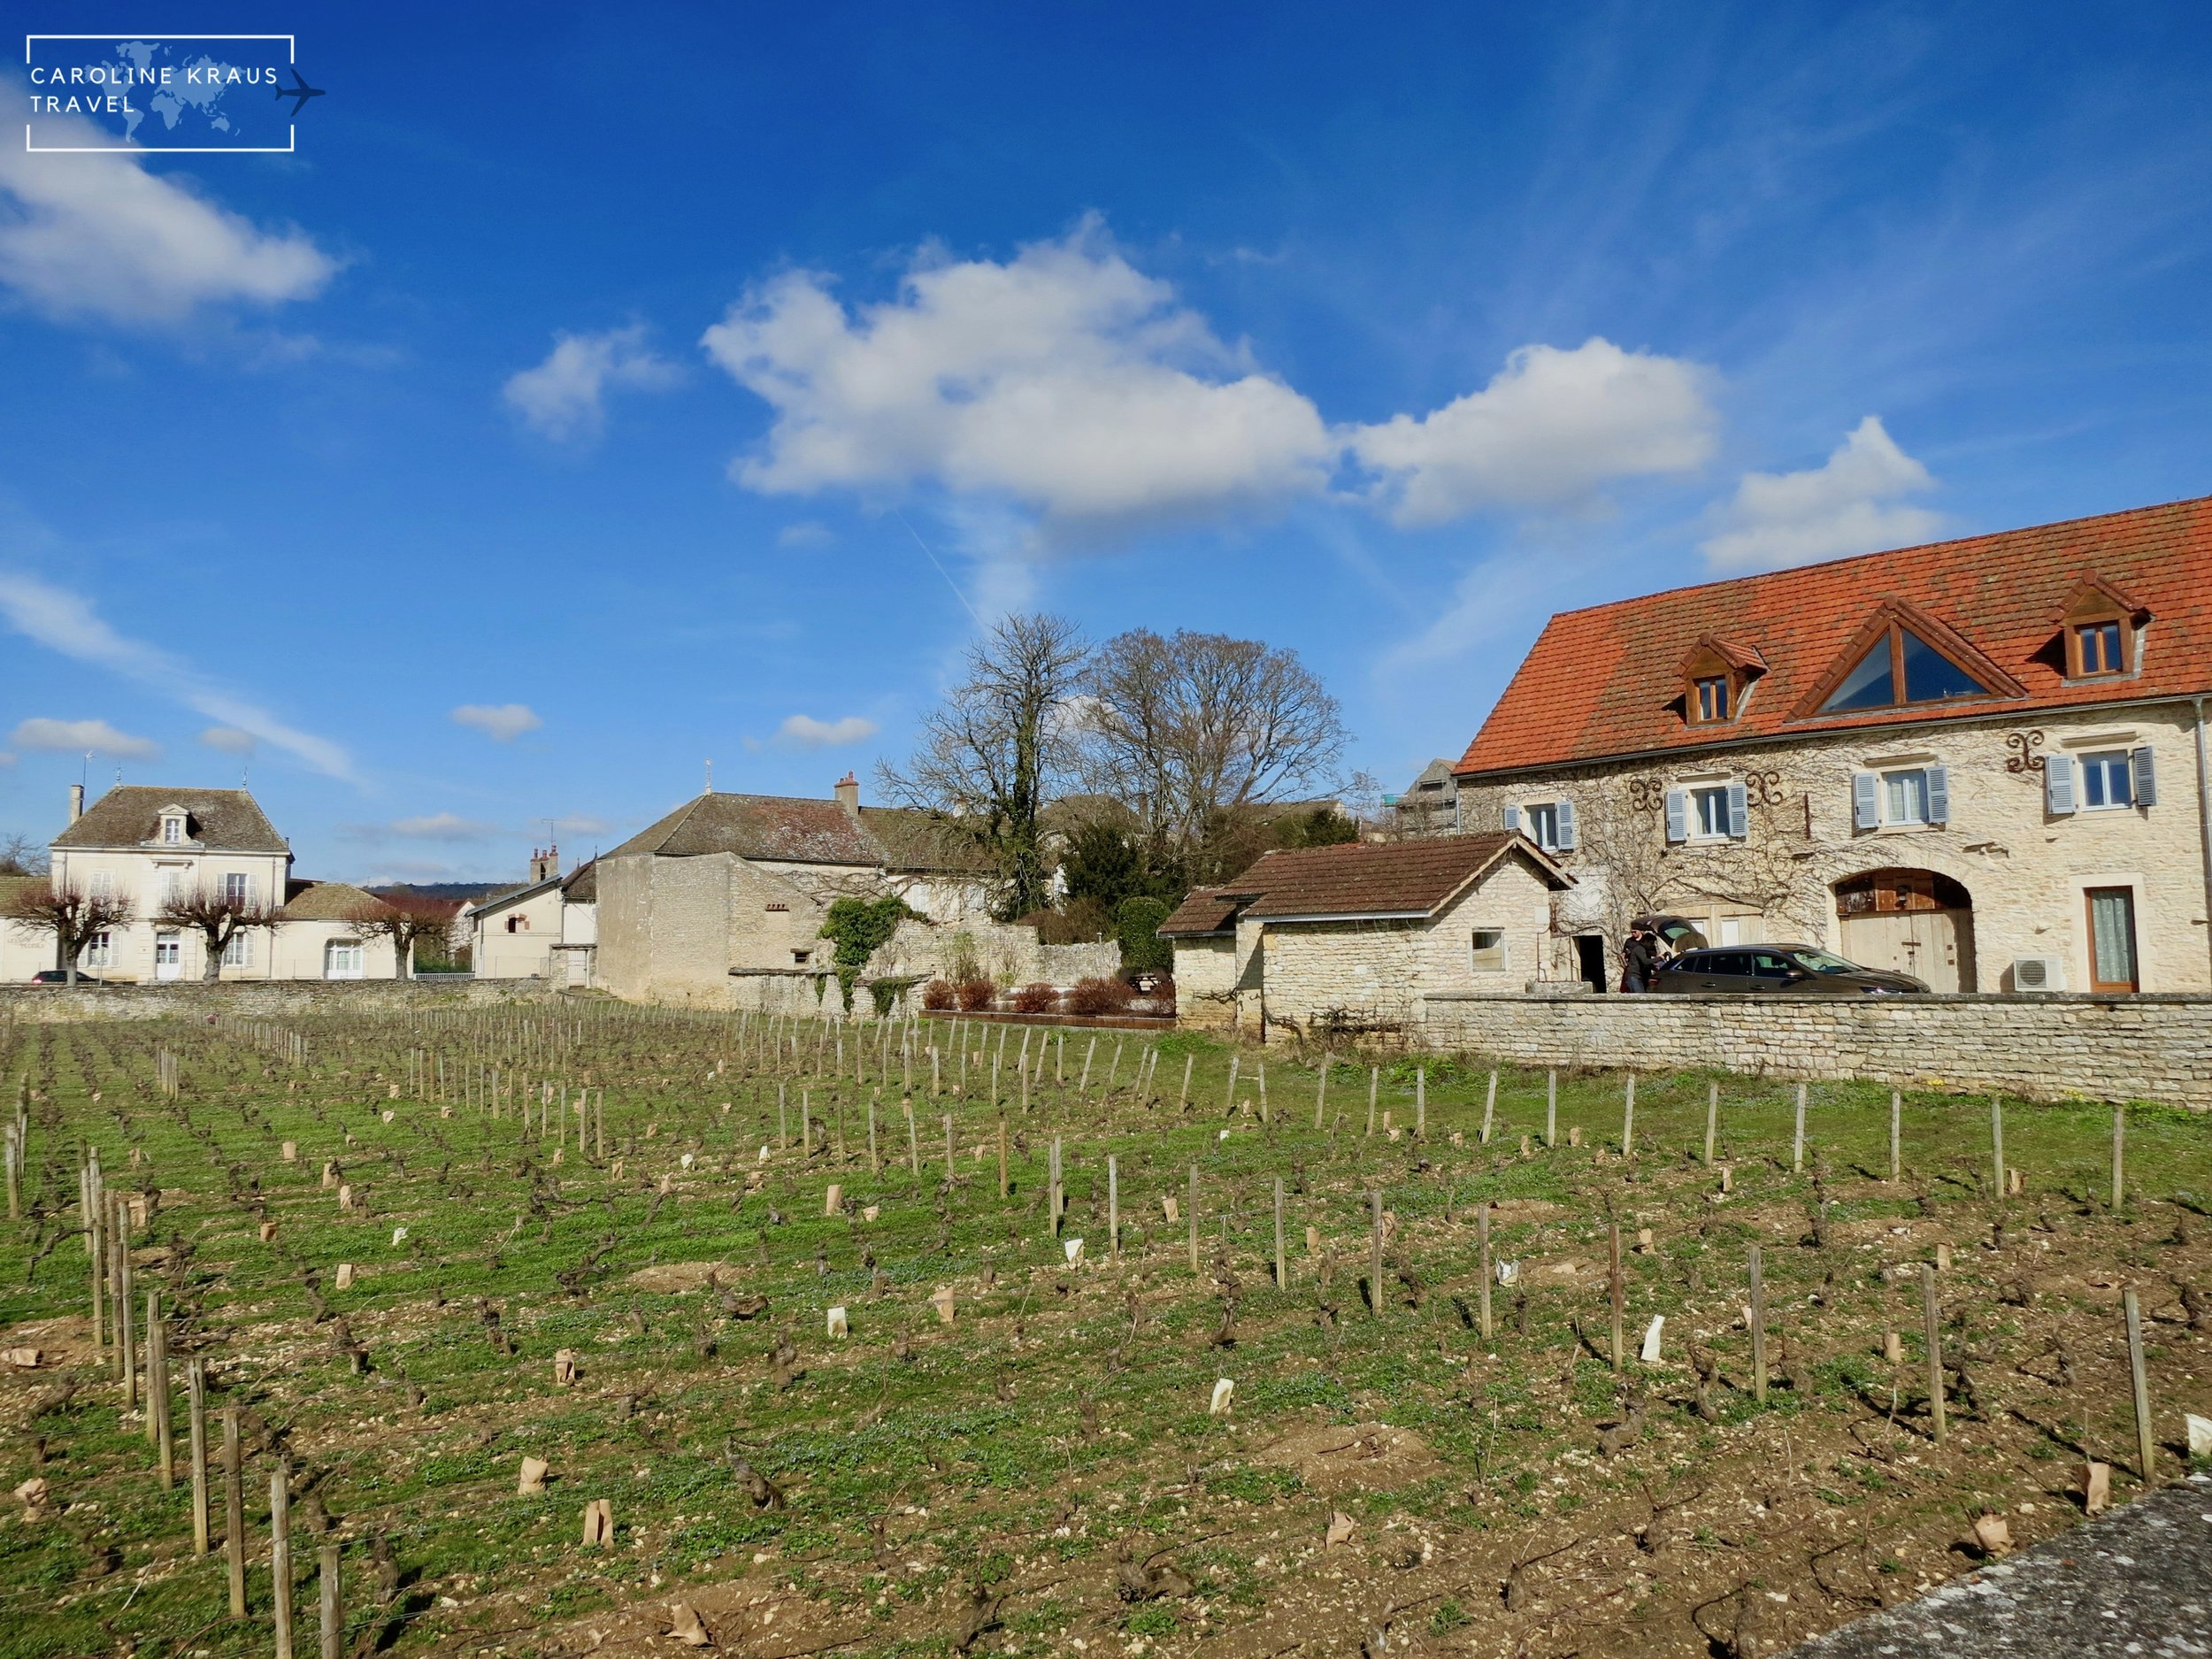 Our house rental in Meursault